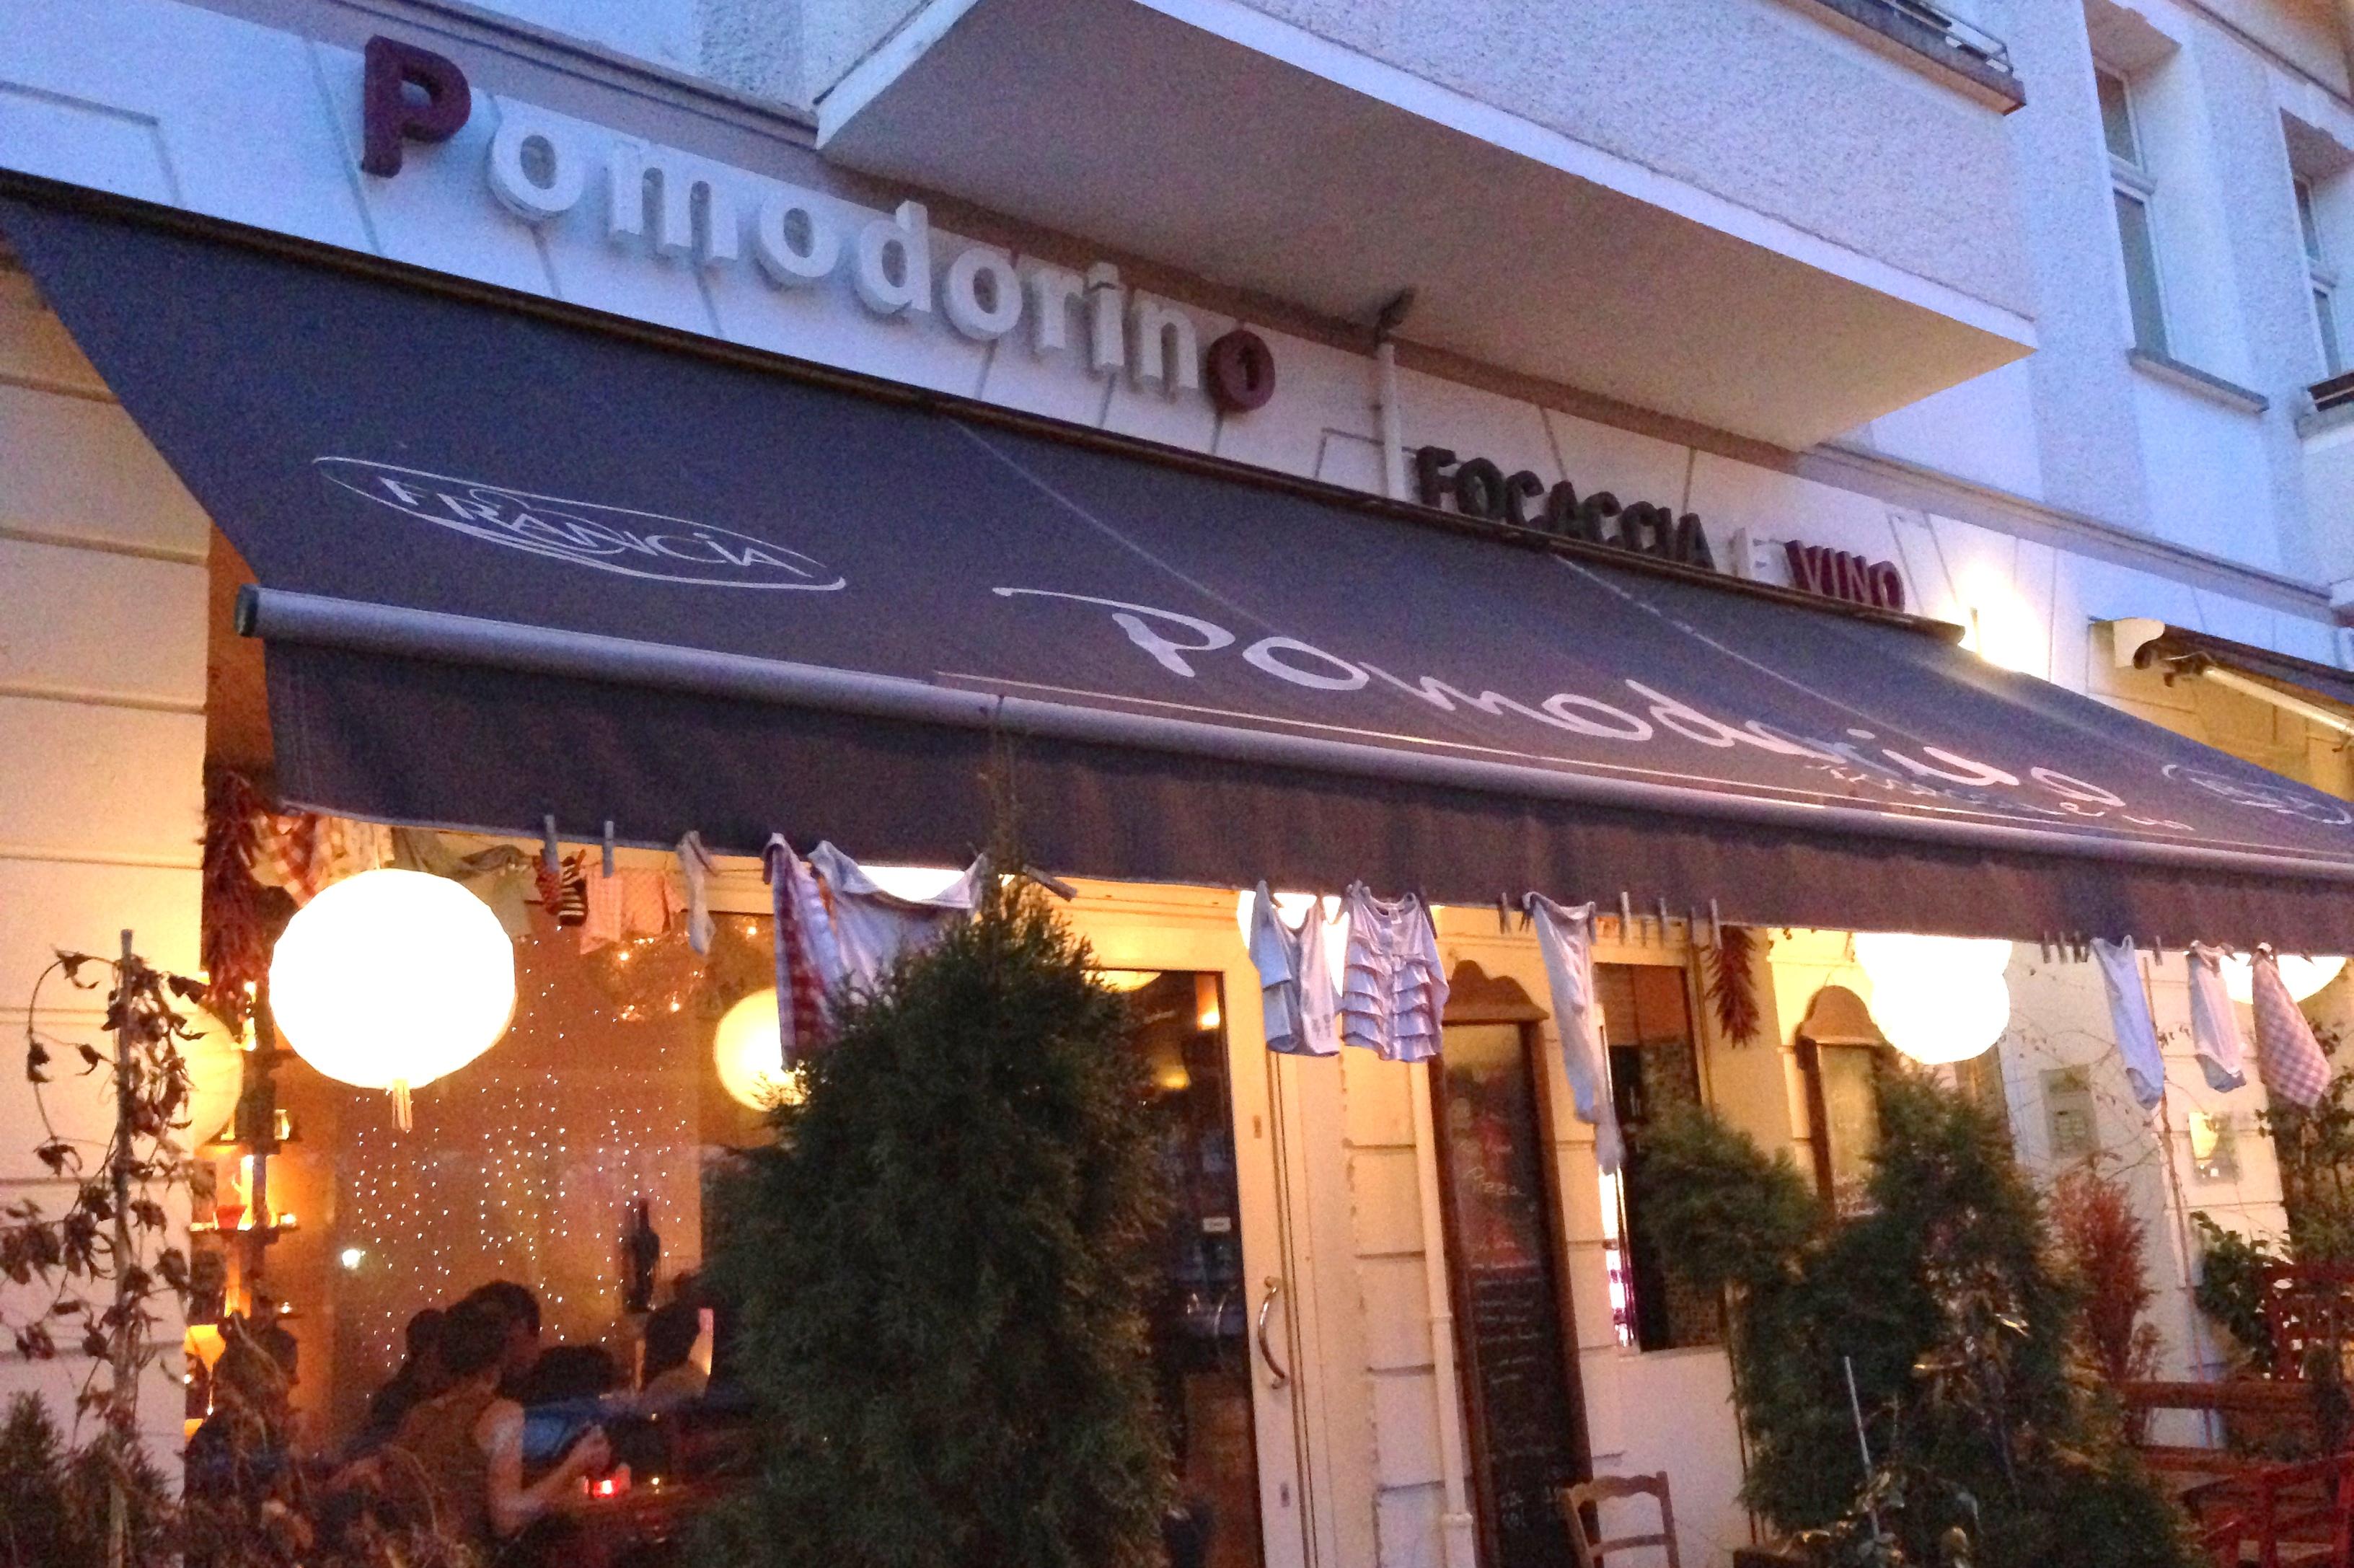 berlin-pomodorino-friedrichshain | berlin ick liebe dir